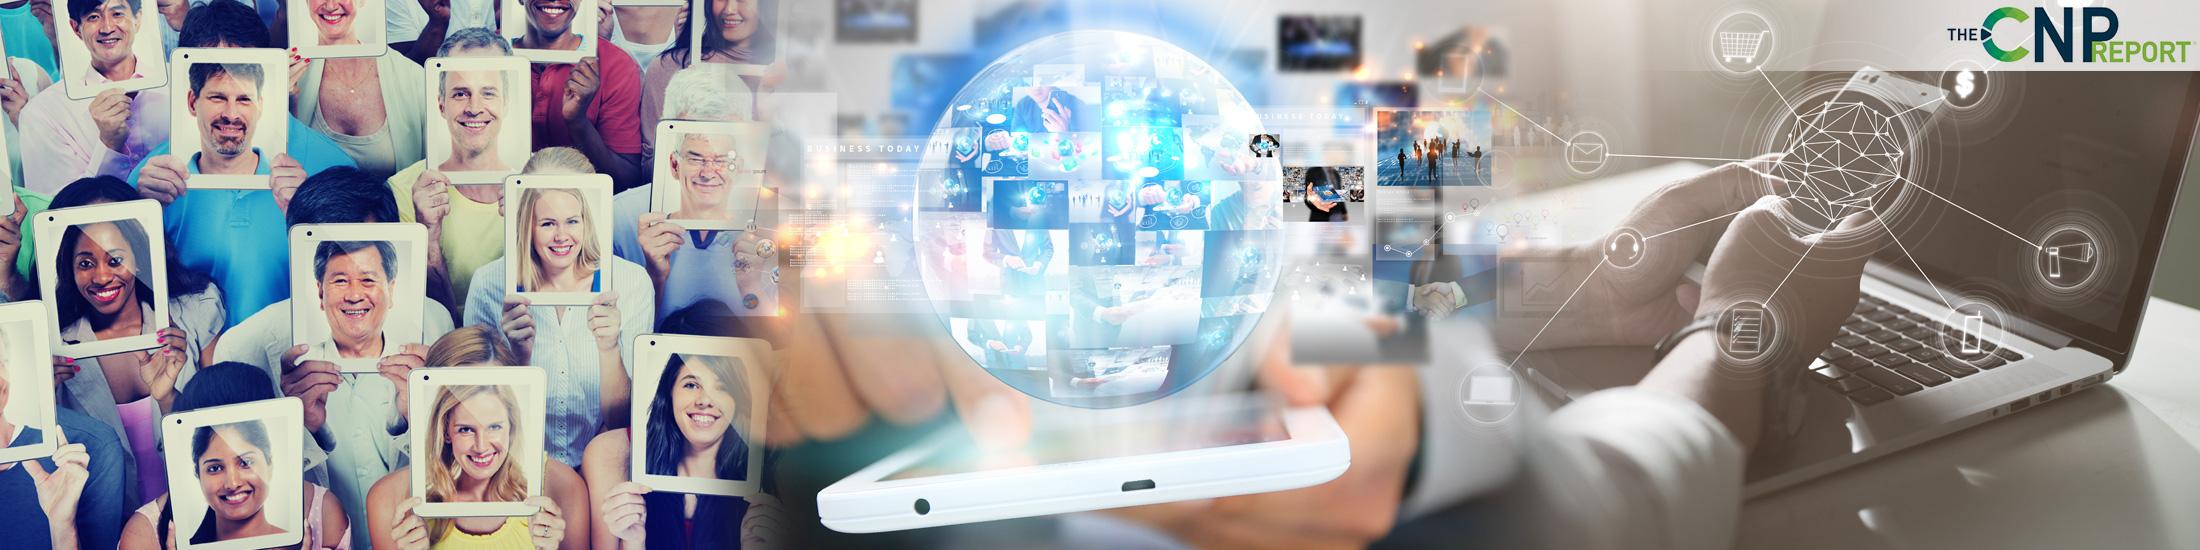 Online Payments Trending on Social Media: Report